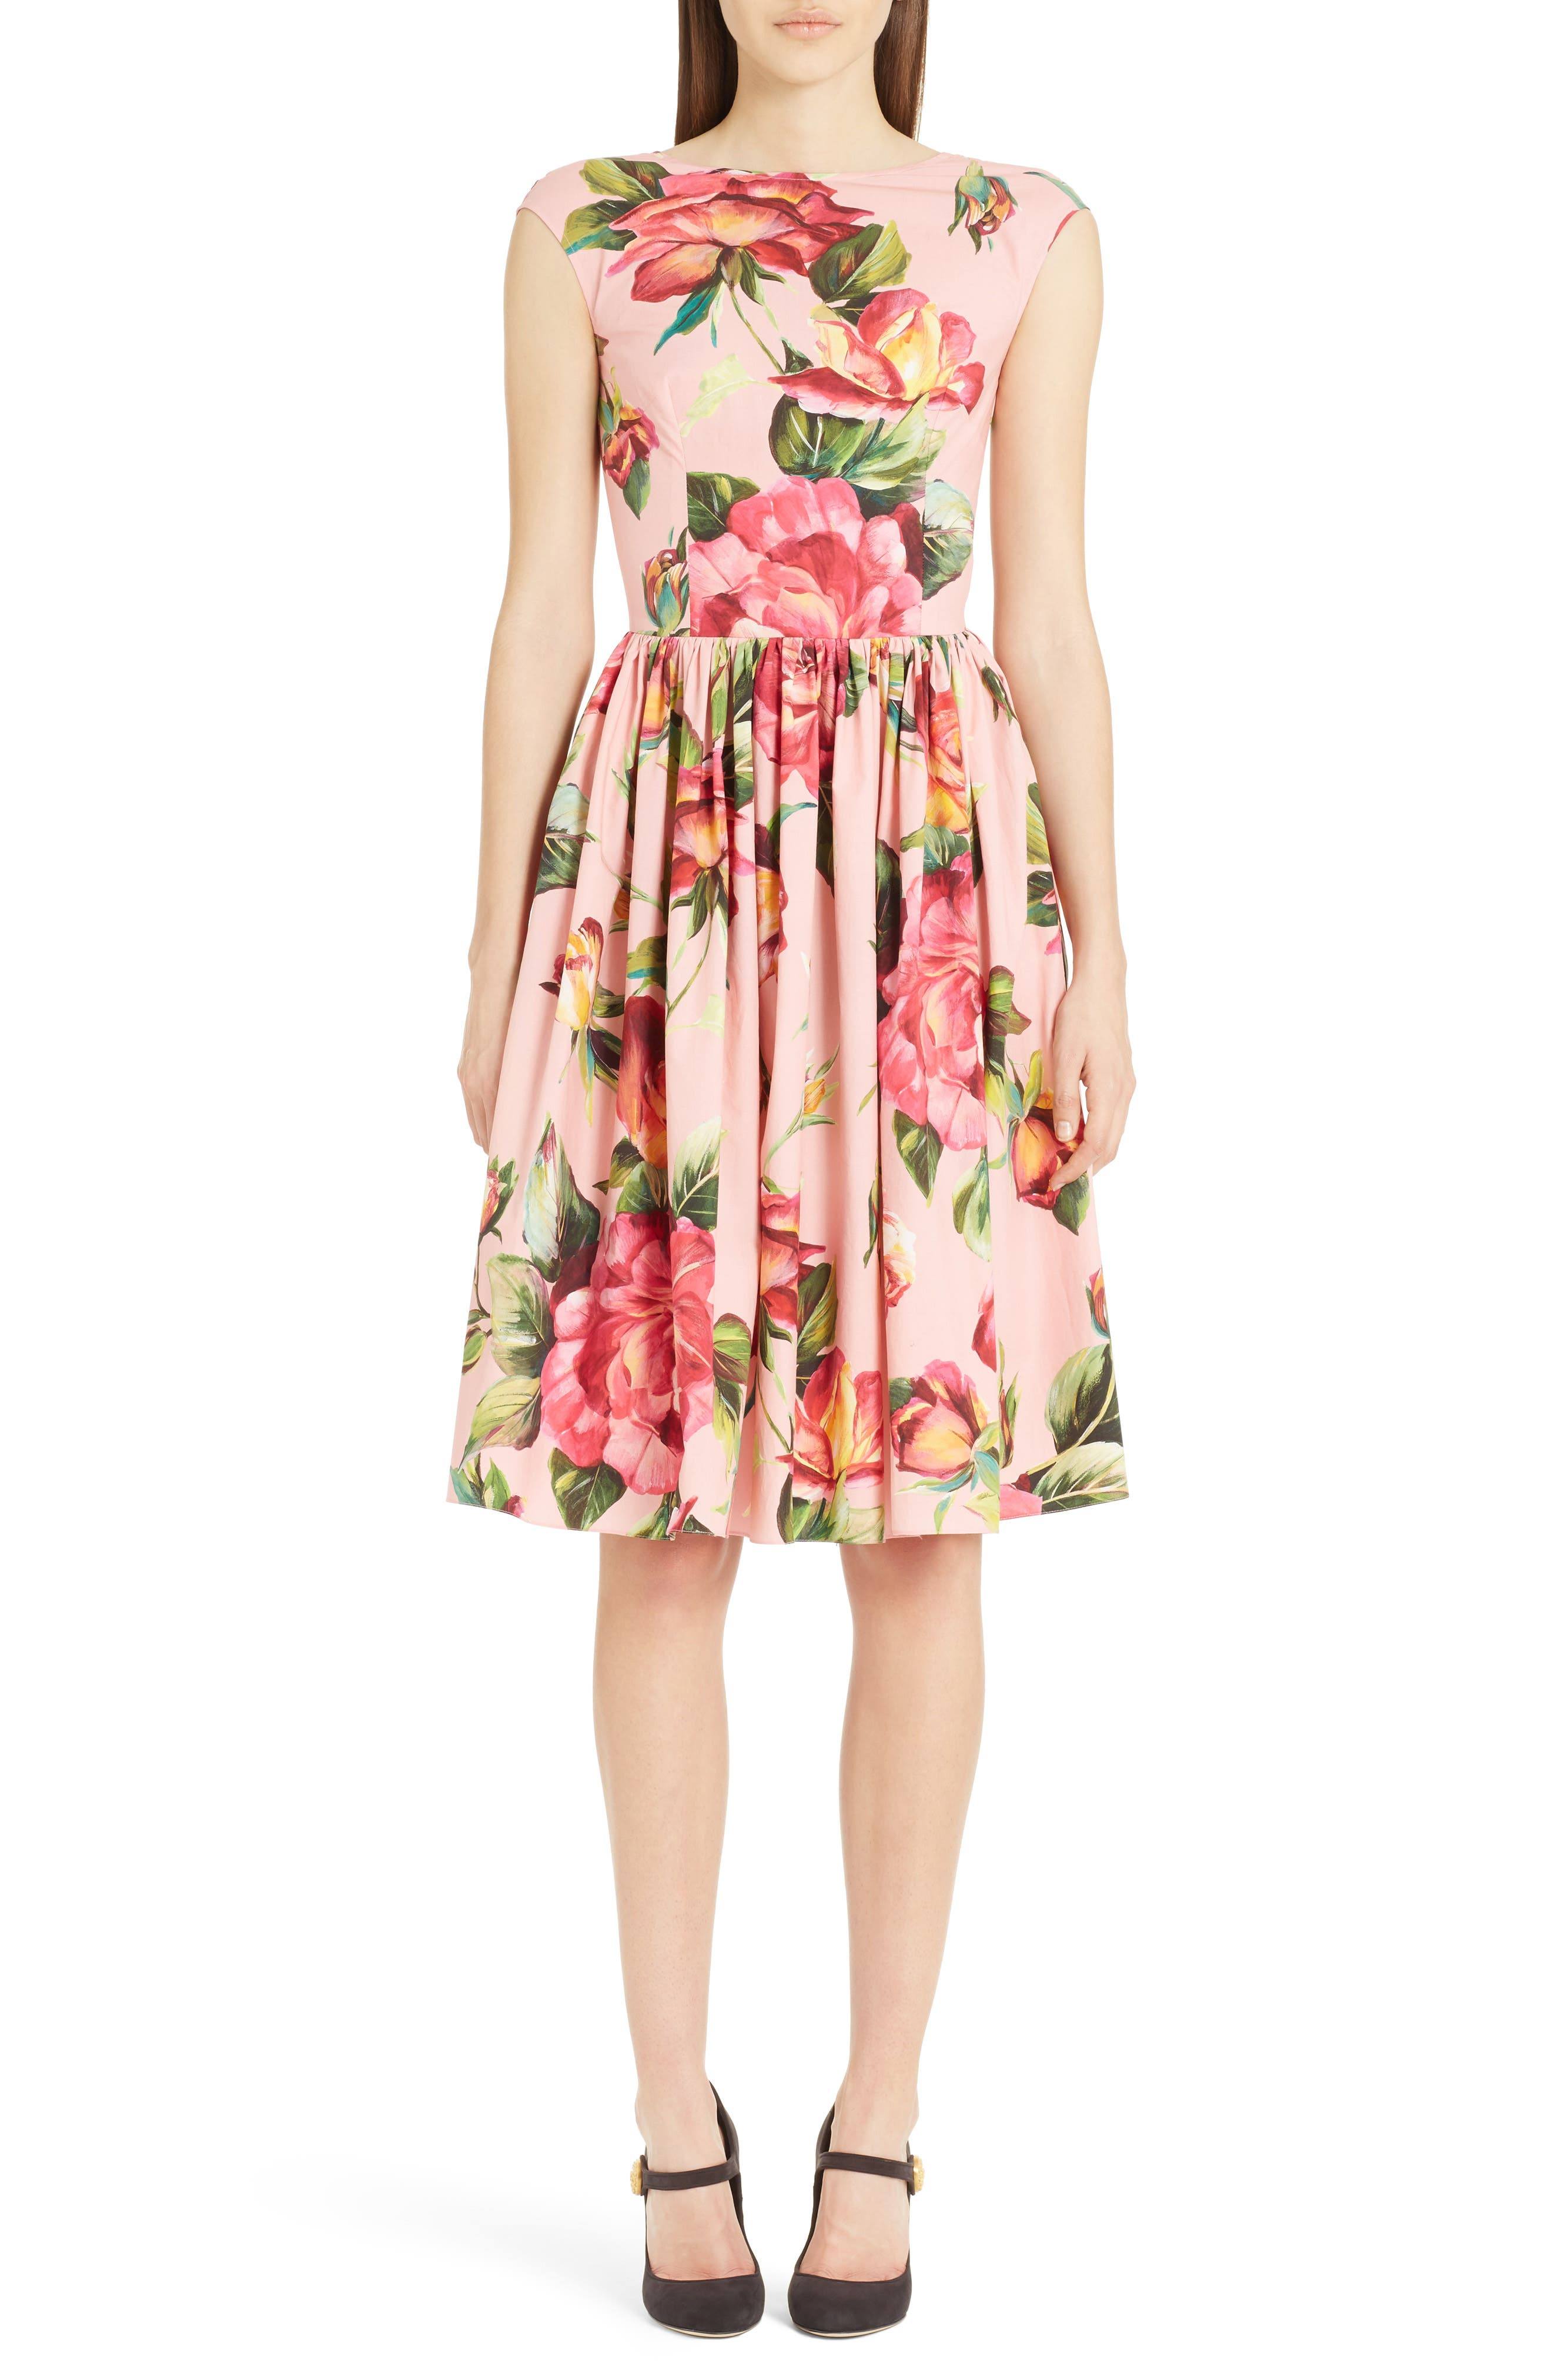 Dolce&Gabbana Rose Print Cotton Poplin Dress